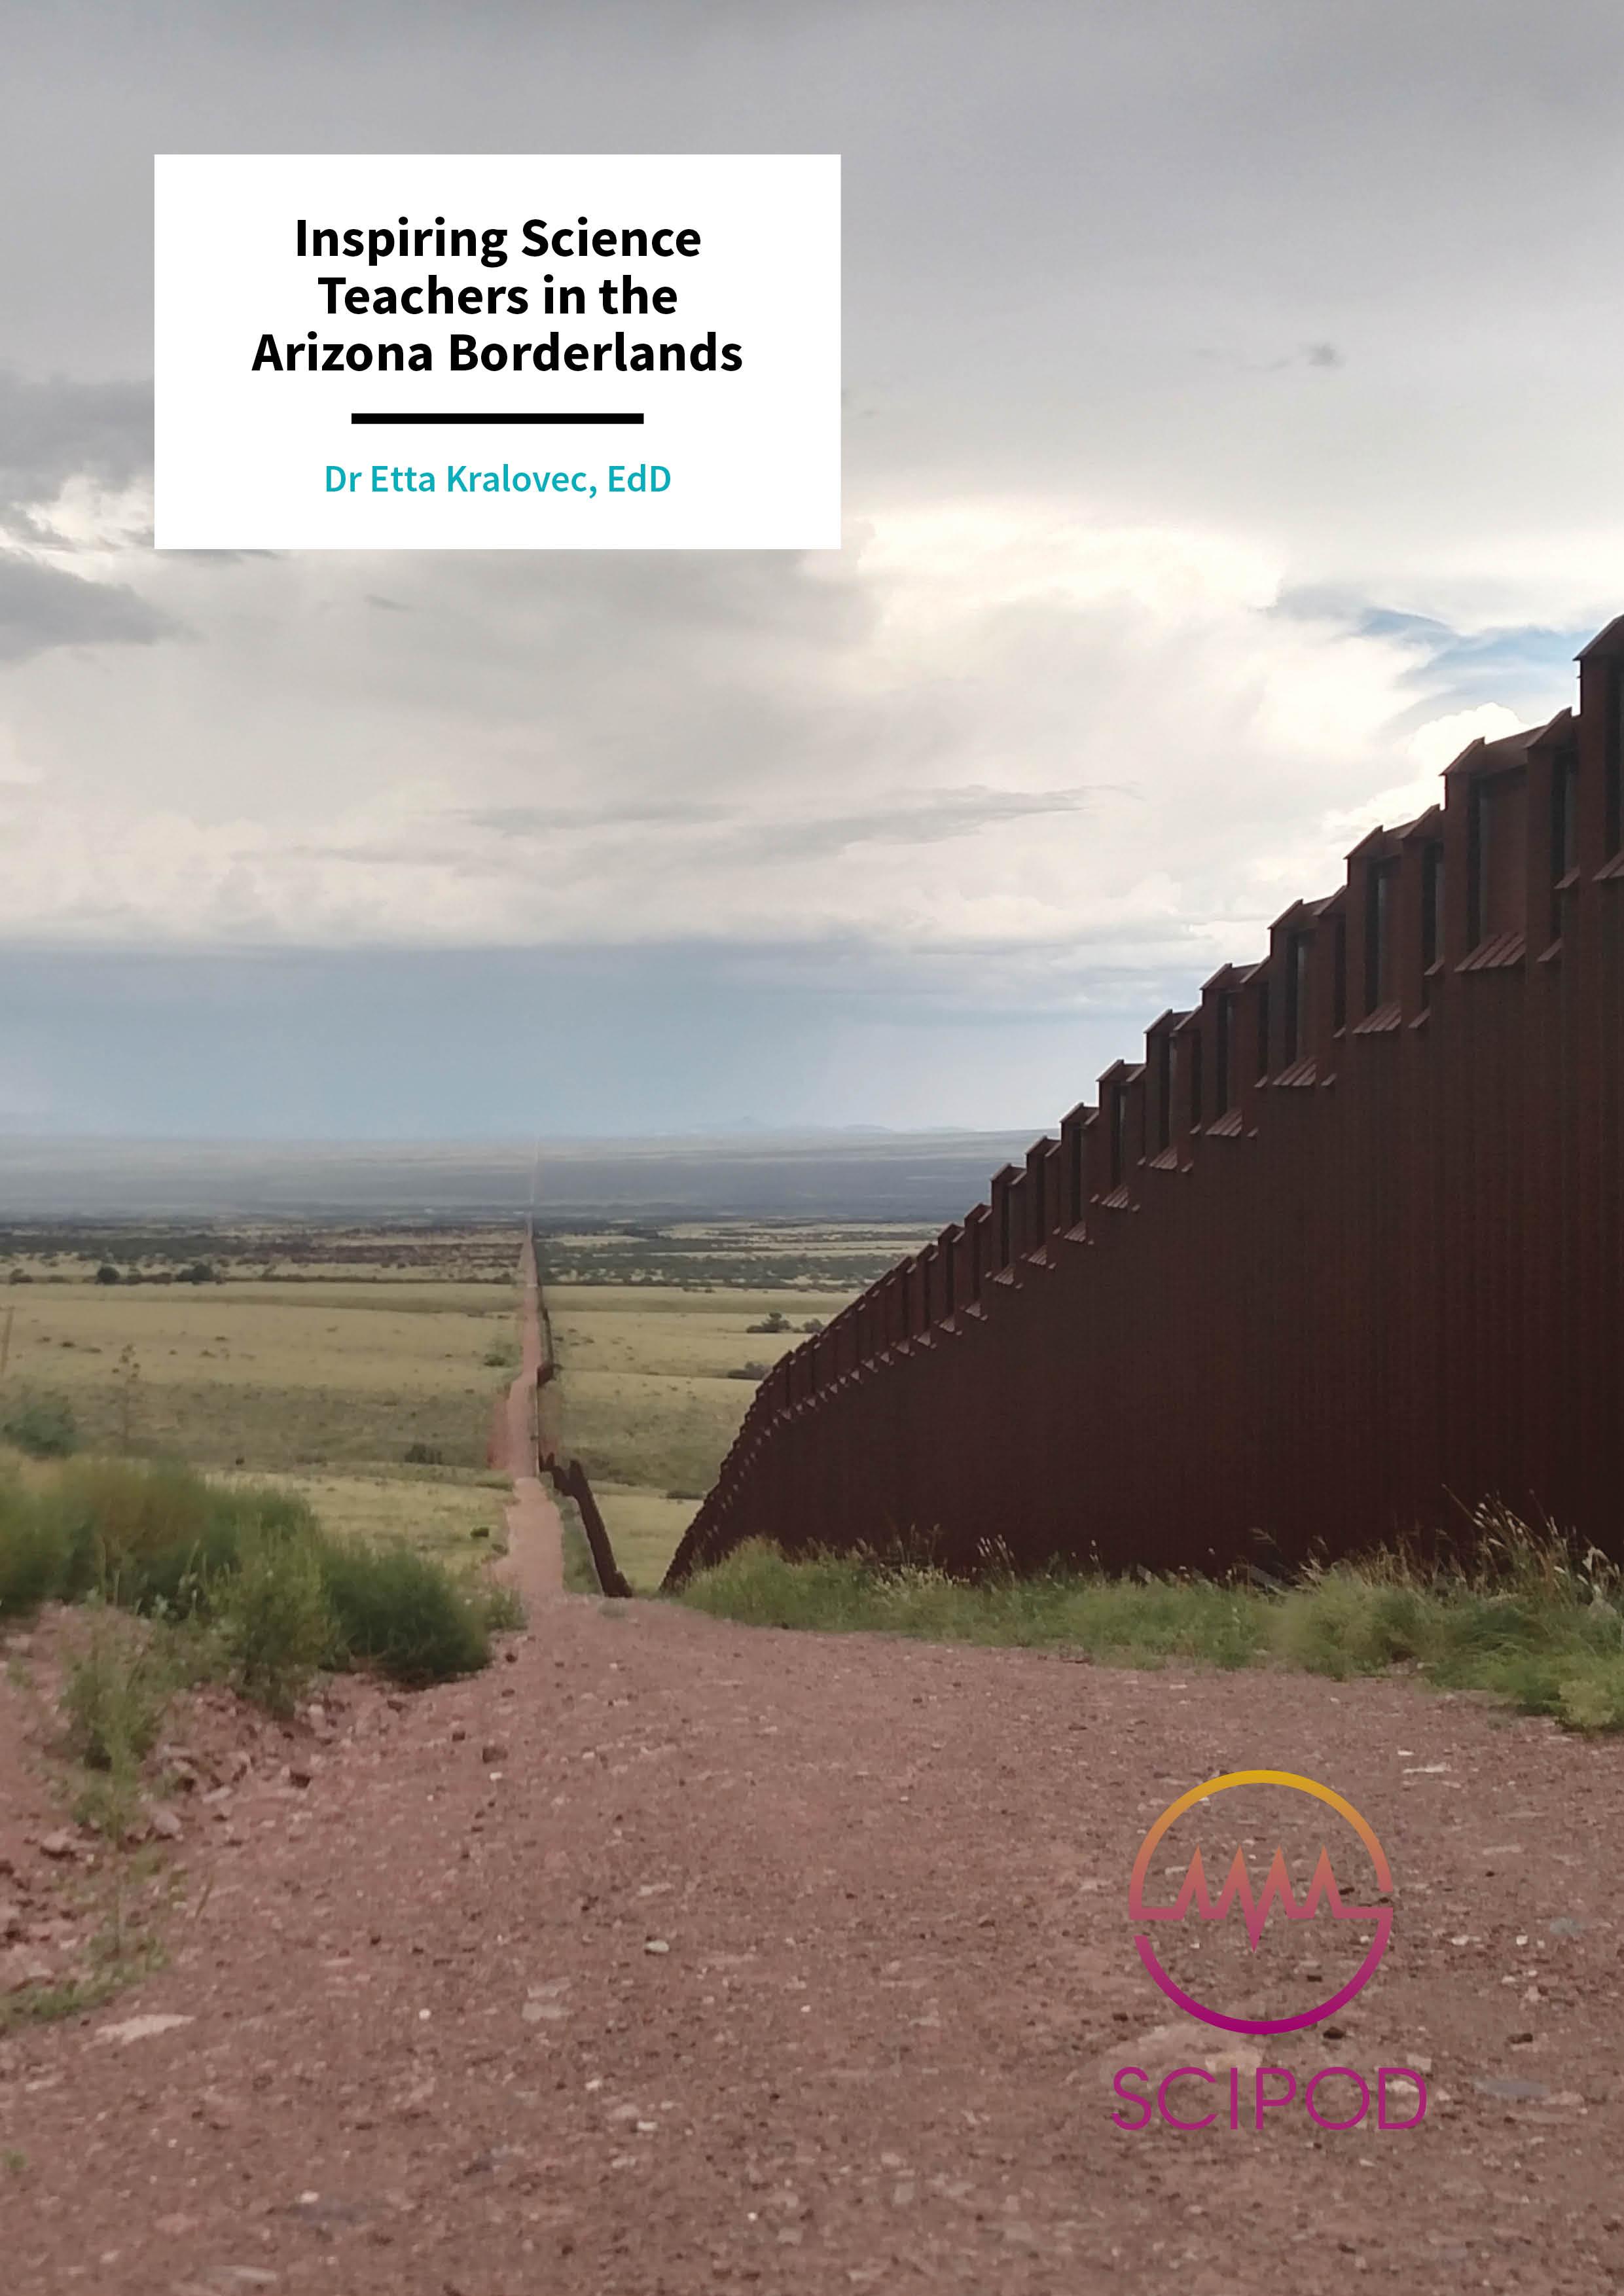 Inspiring Science Teachers in the Arizona Borderlands – Dr Etta Kralovec, University of Arizona, South